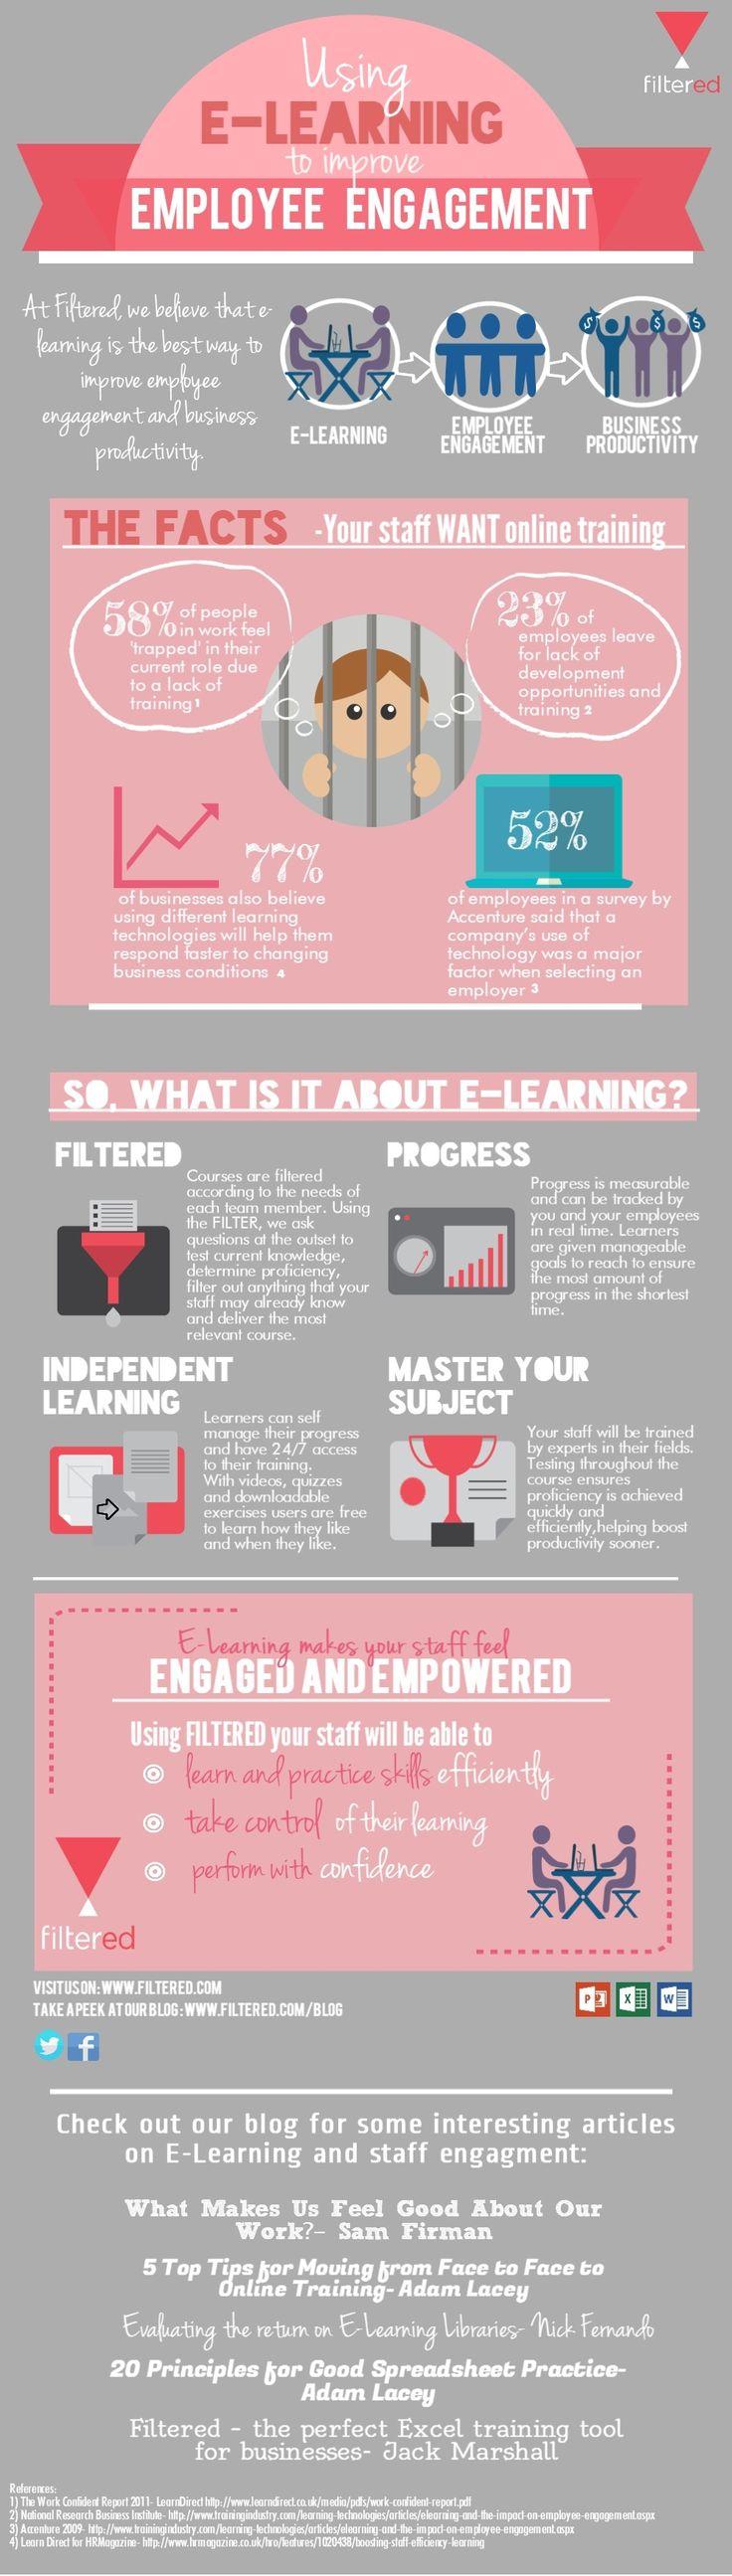 Using #eLearning to Improve Employee Engagement